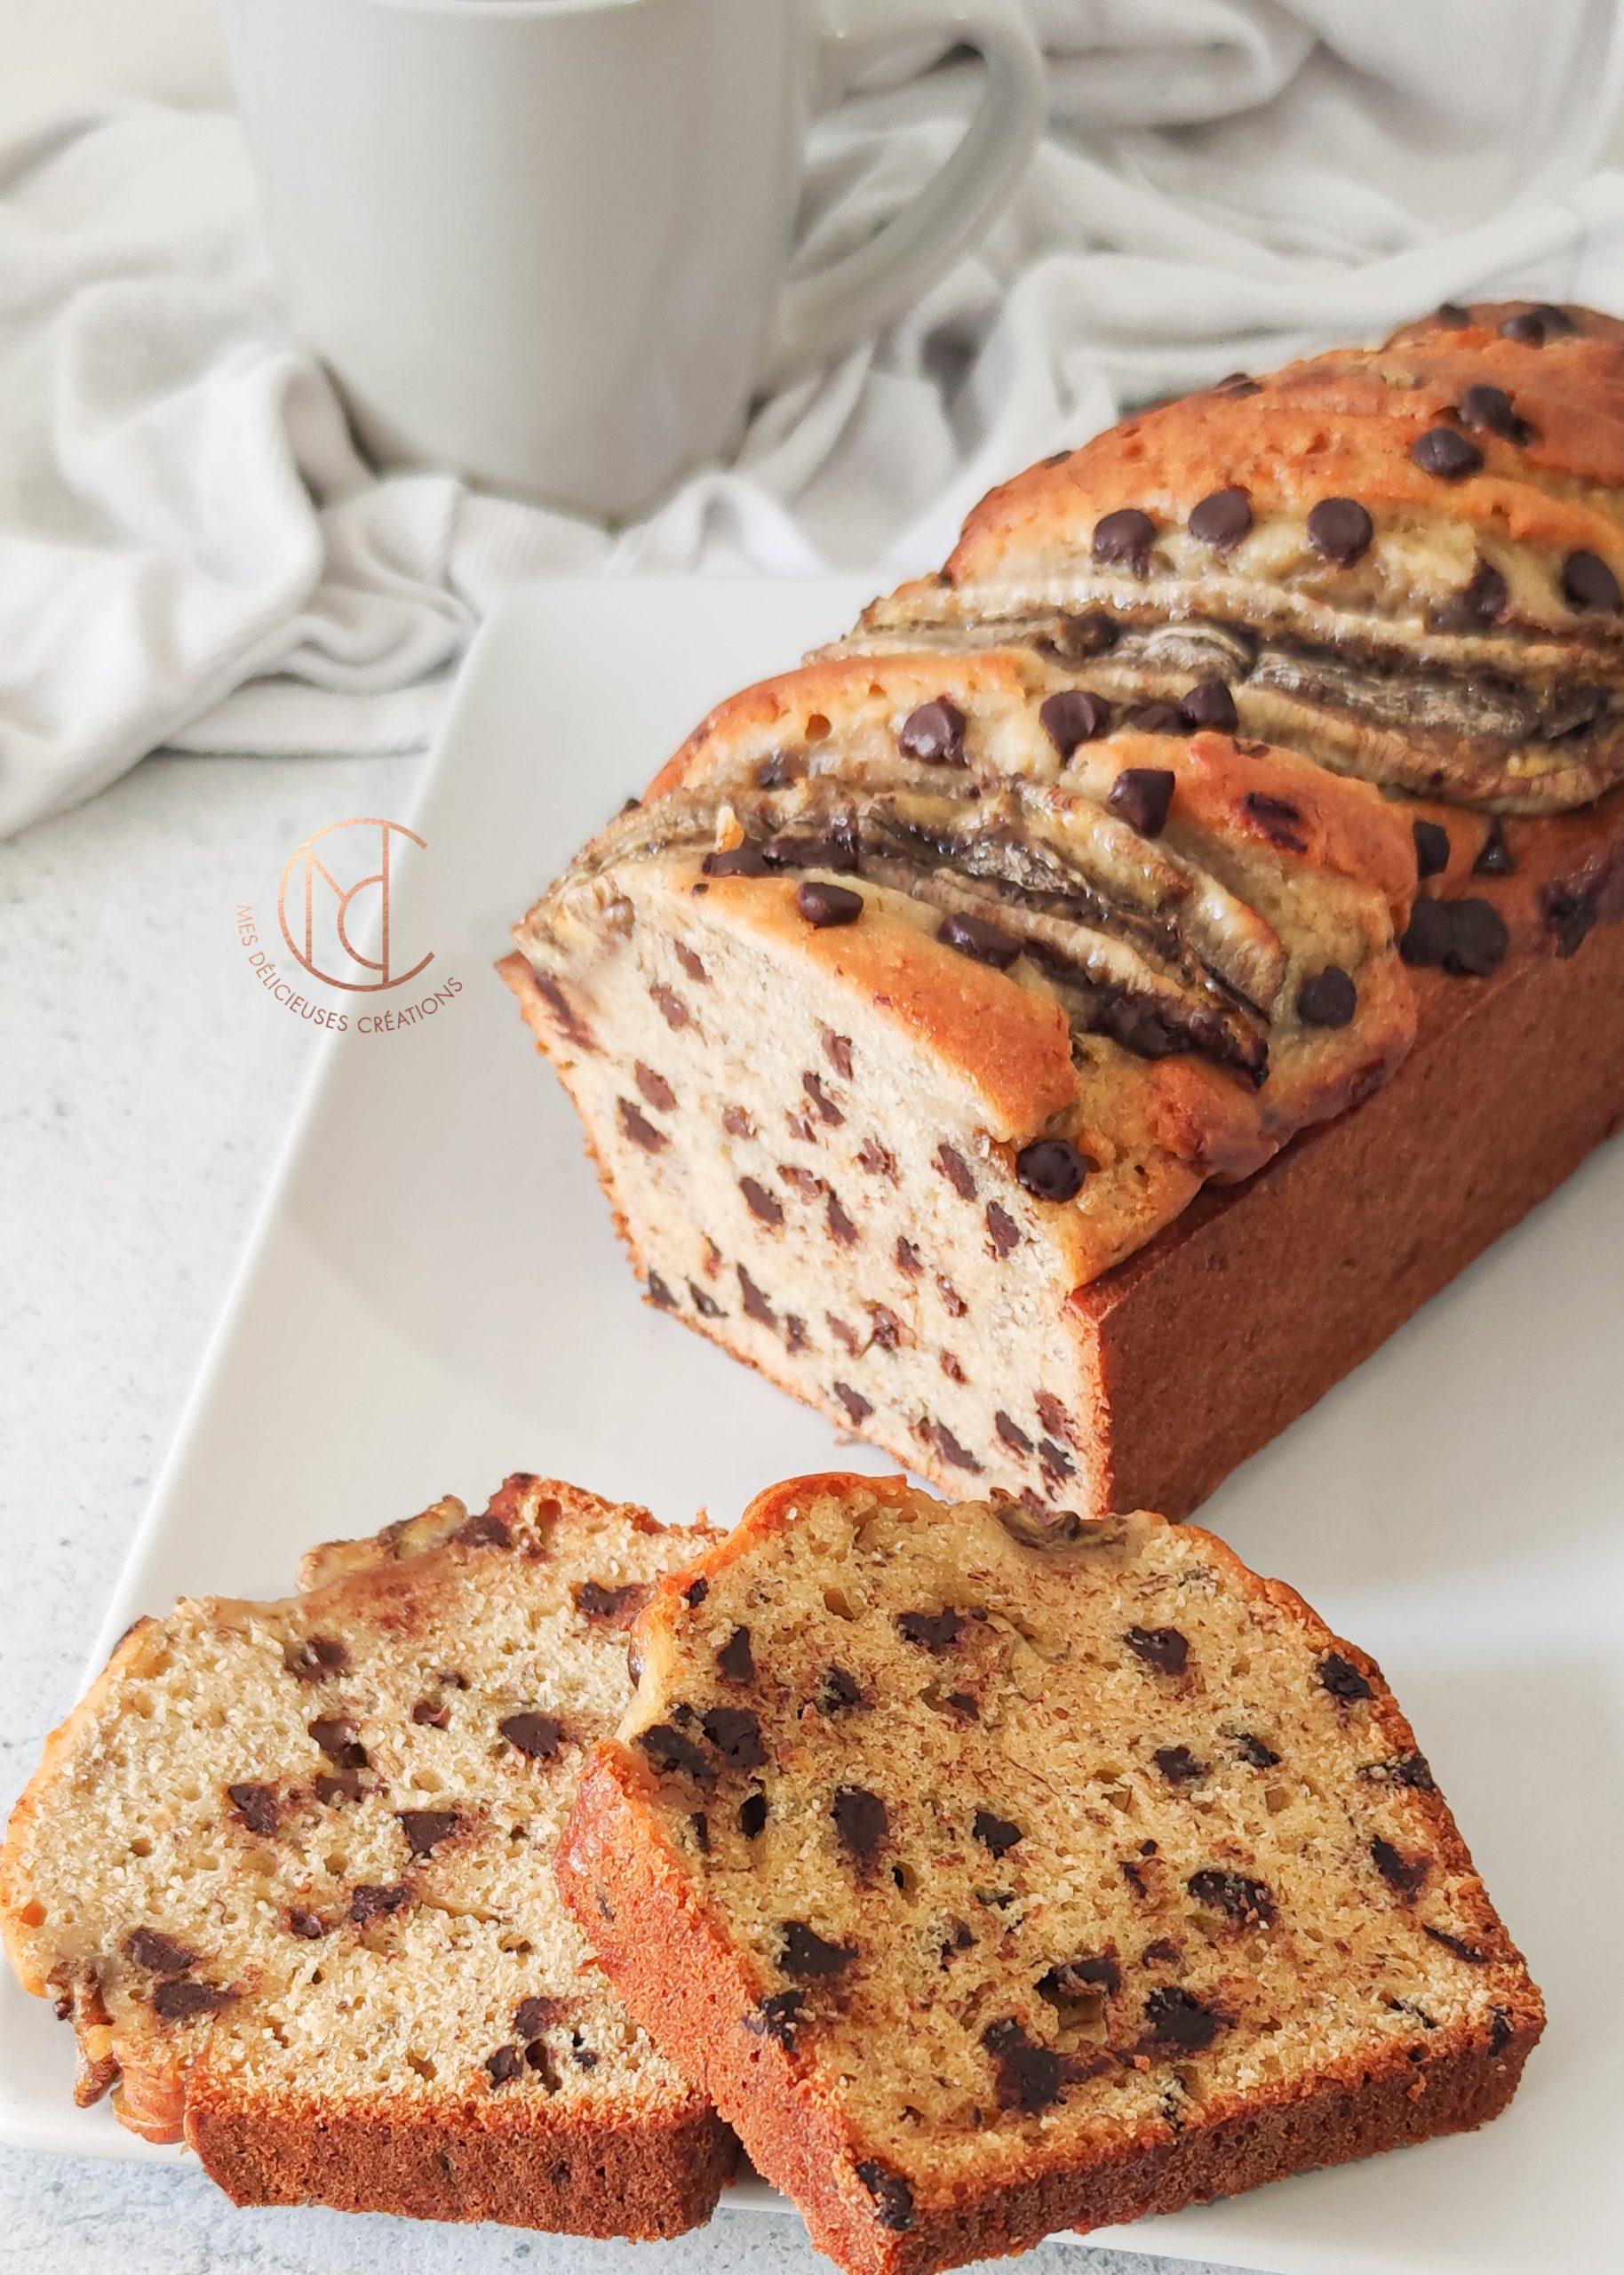 degustation-cake-banane-beurre-de-cacahuetes